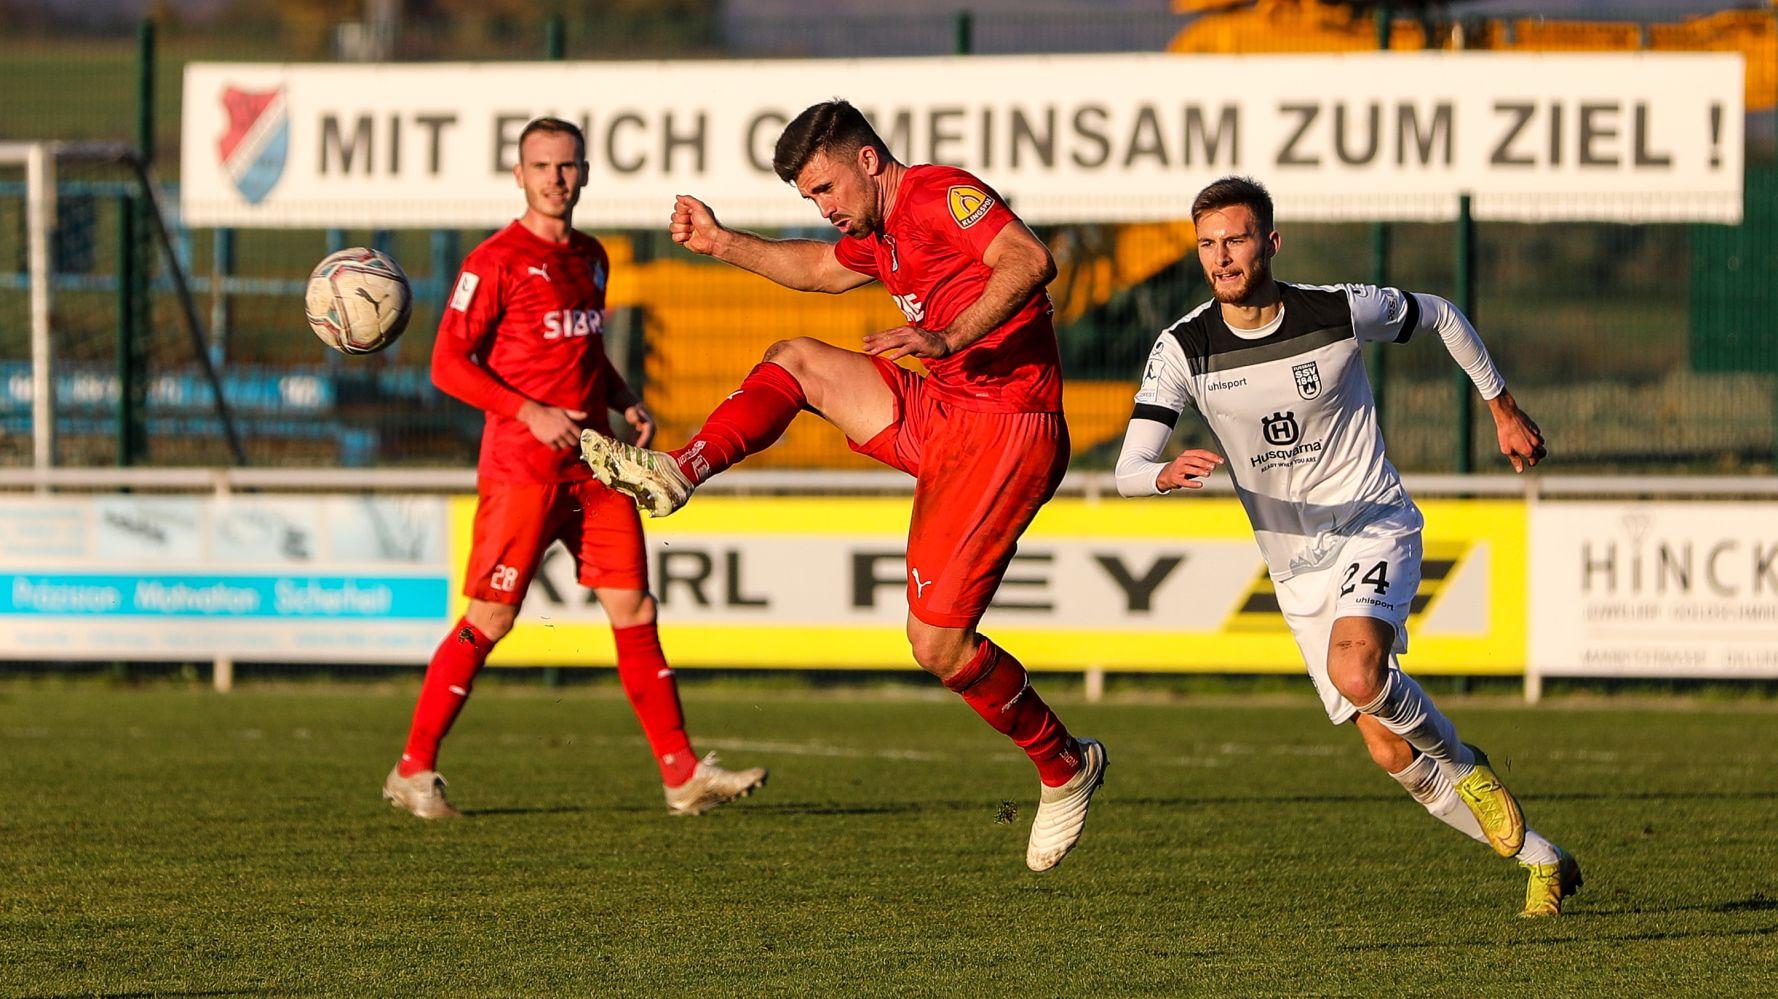 AlAzzawe TSV Steinbach Haiger Ulm HP